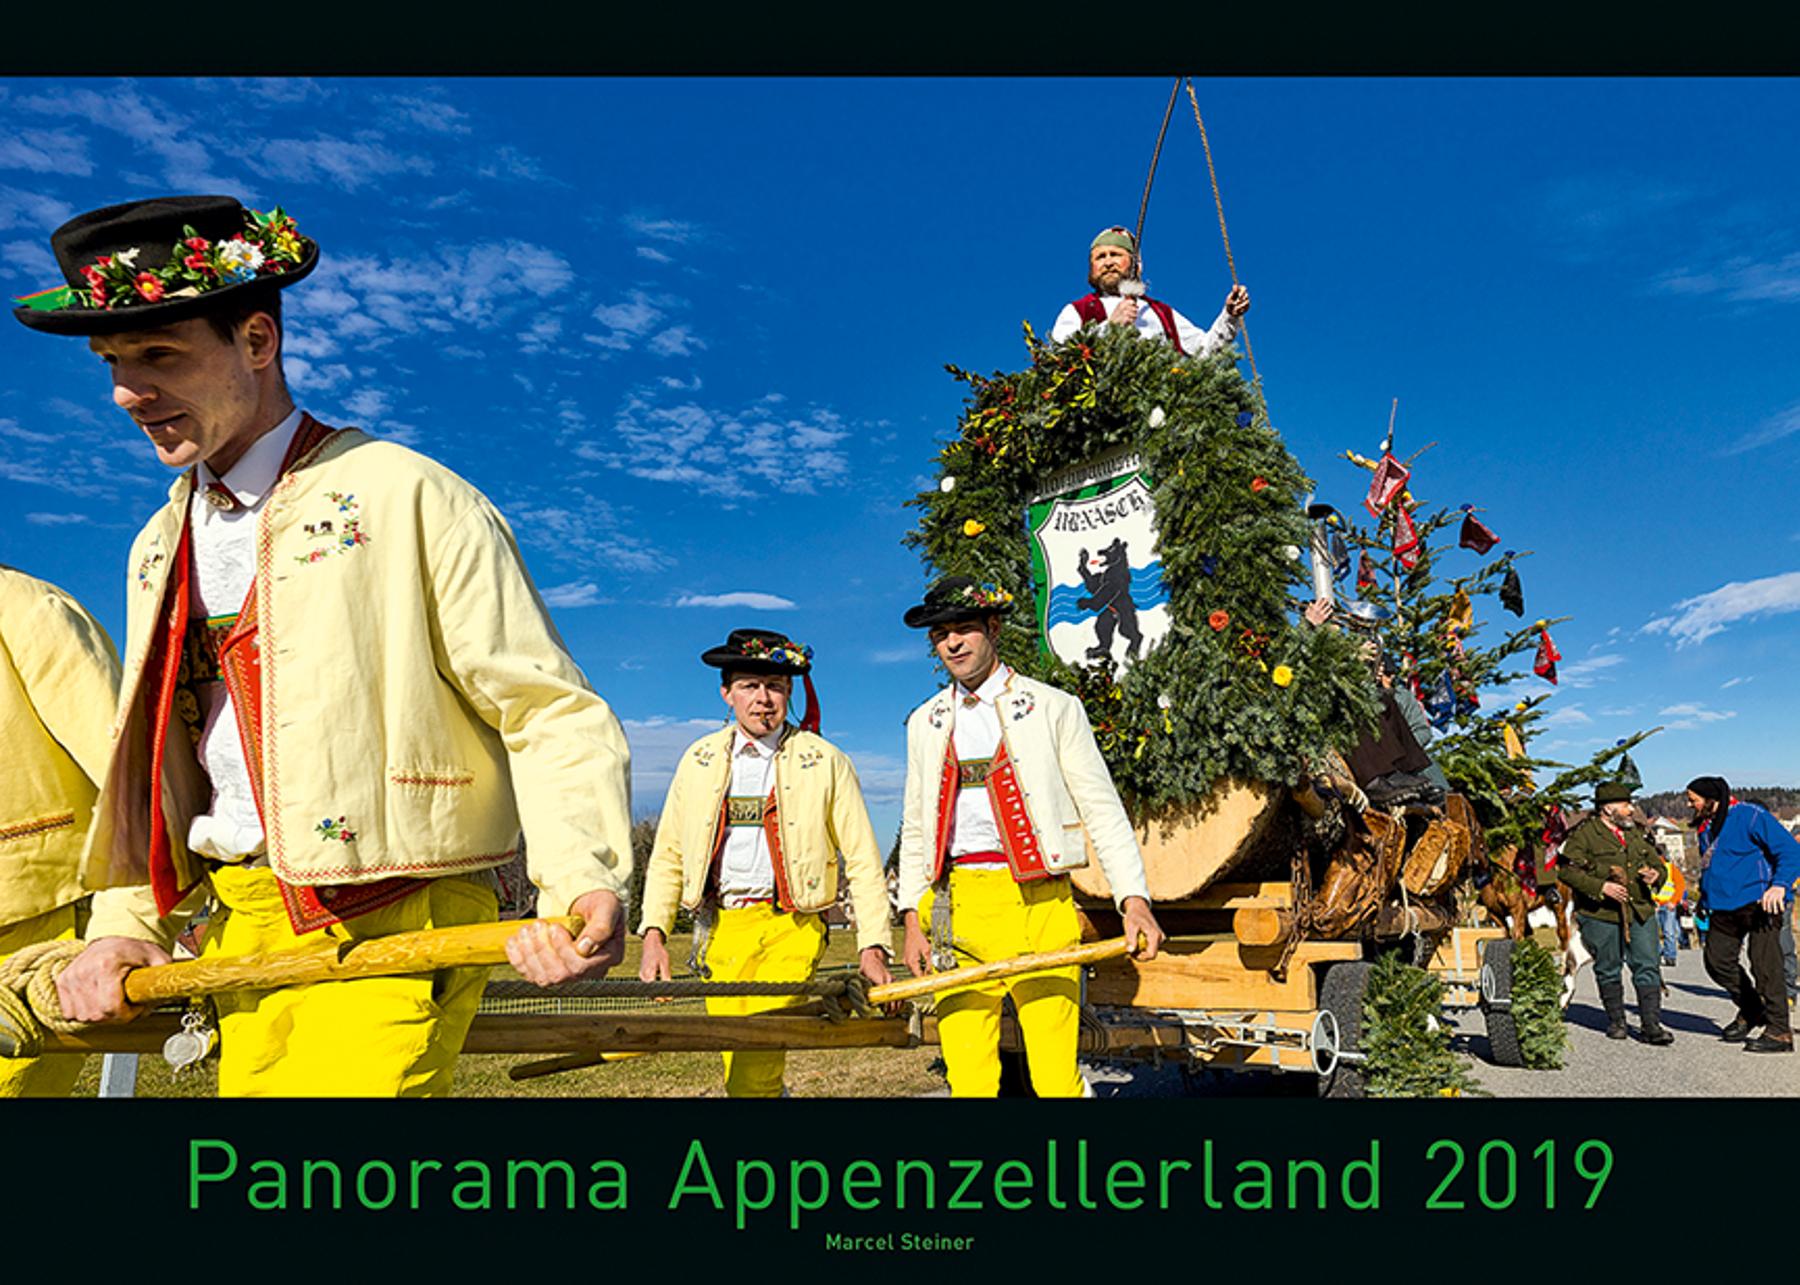 Panorama Appenzellerland 2019